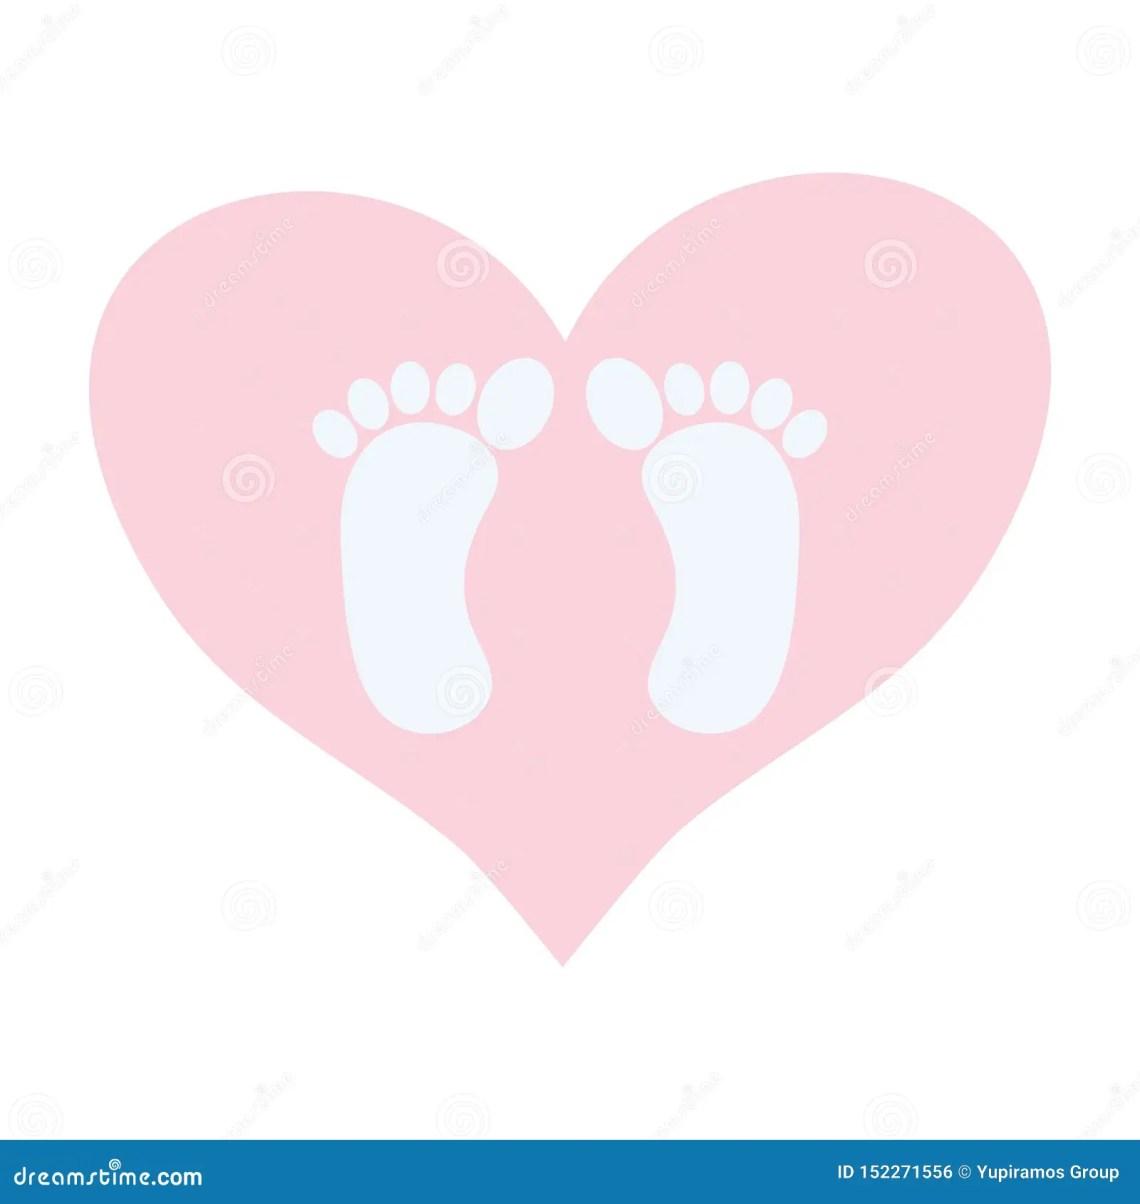 Download Baby Foot Prints In Heart Love Stock Vector - Illustration ...